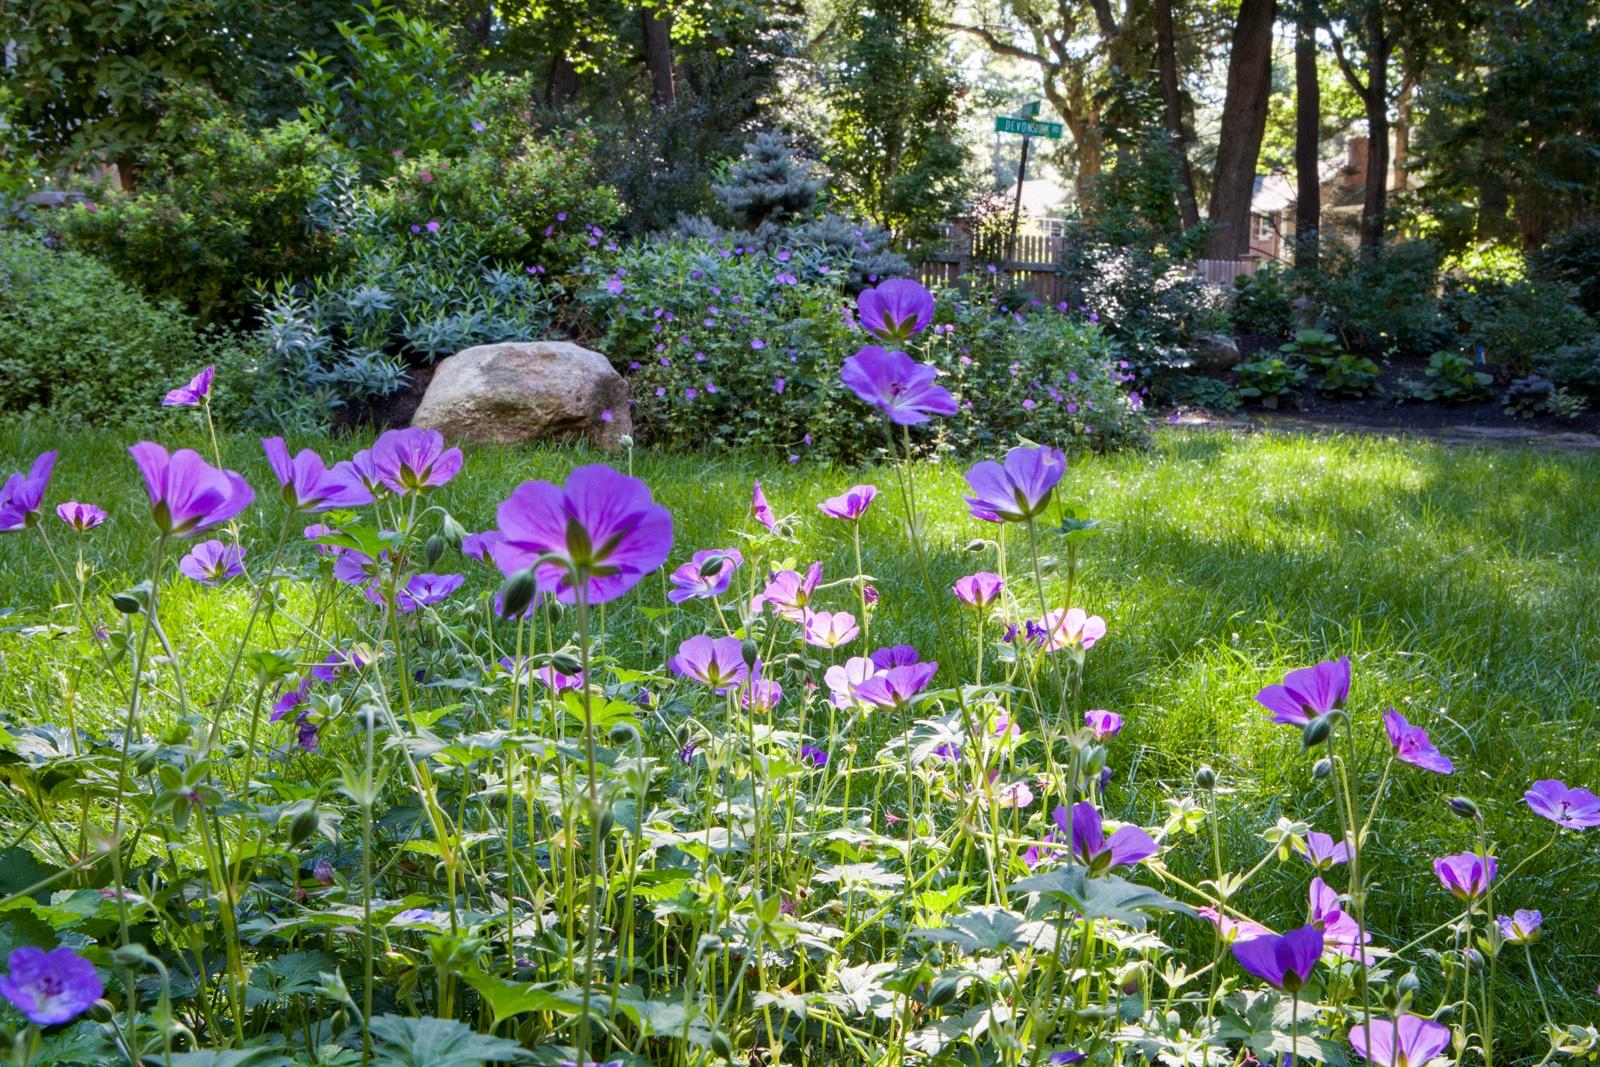 flower garden for pollinators